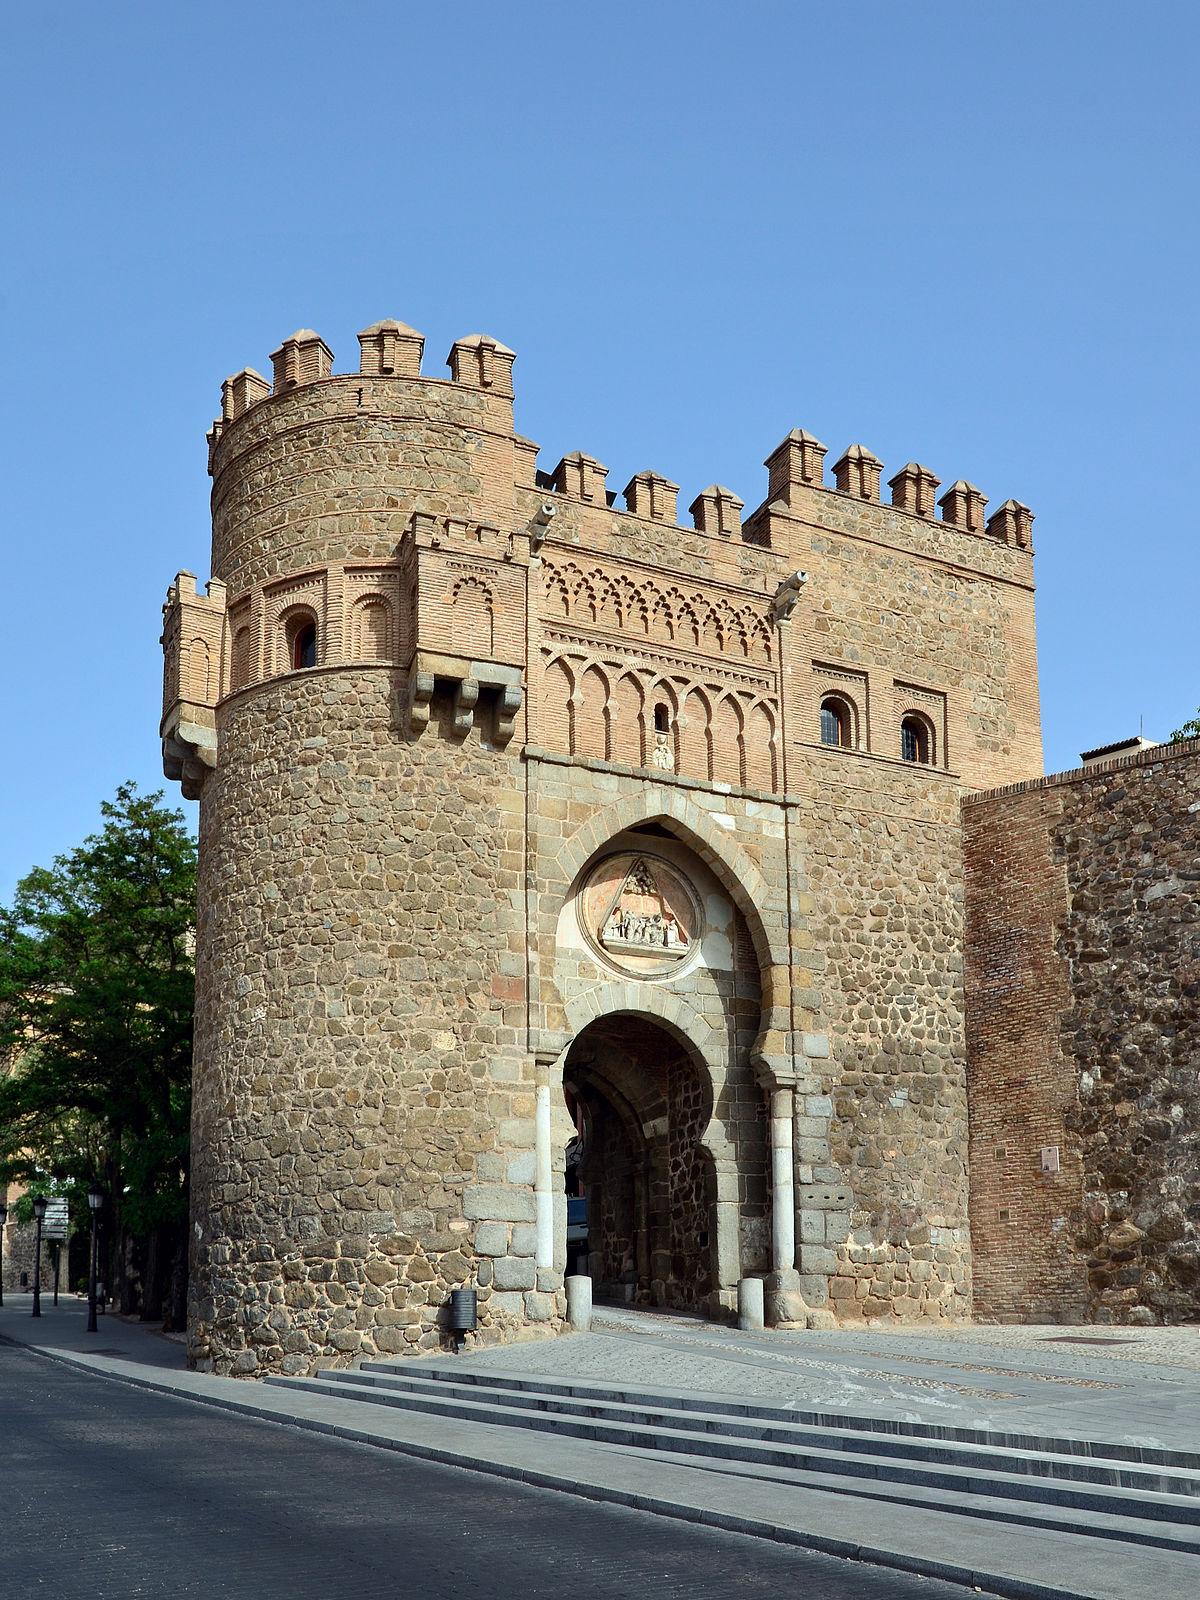 Puerta del sol toledo wikipedia for Centro oftalmologico puerta del sol